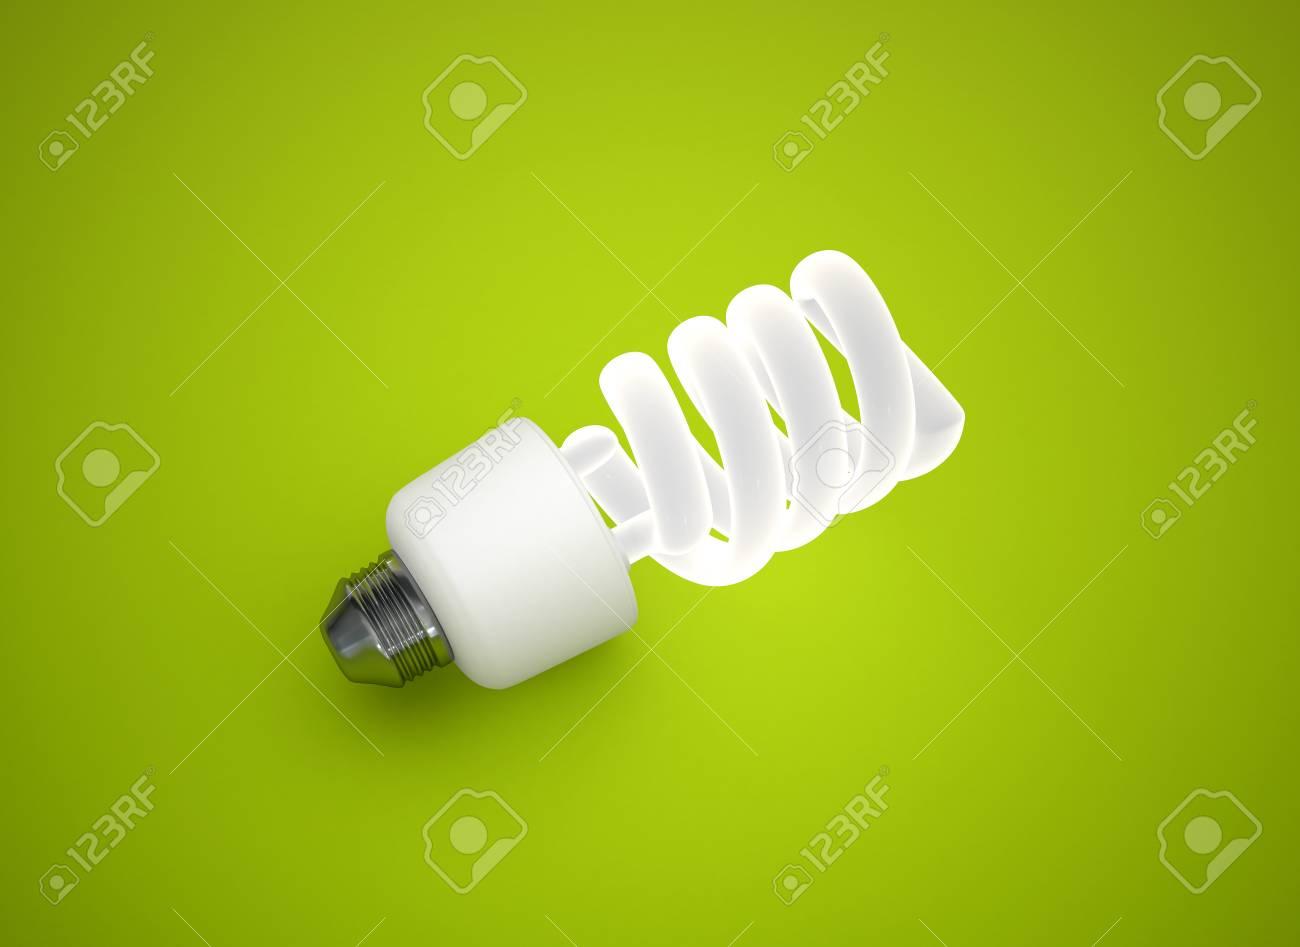 energy saving light bulb on green background Stock Photo - 8378424